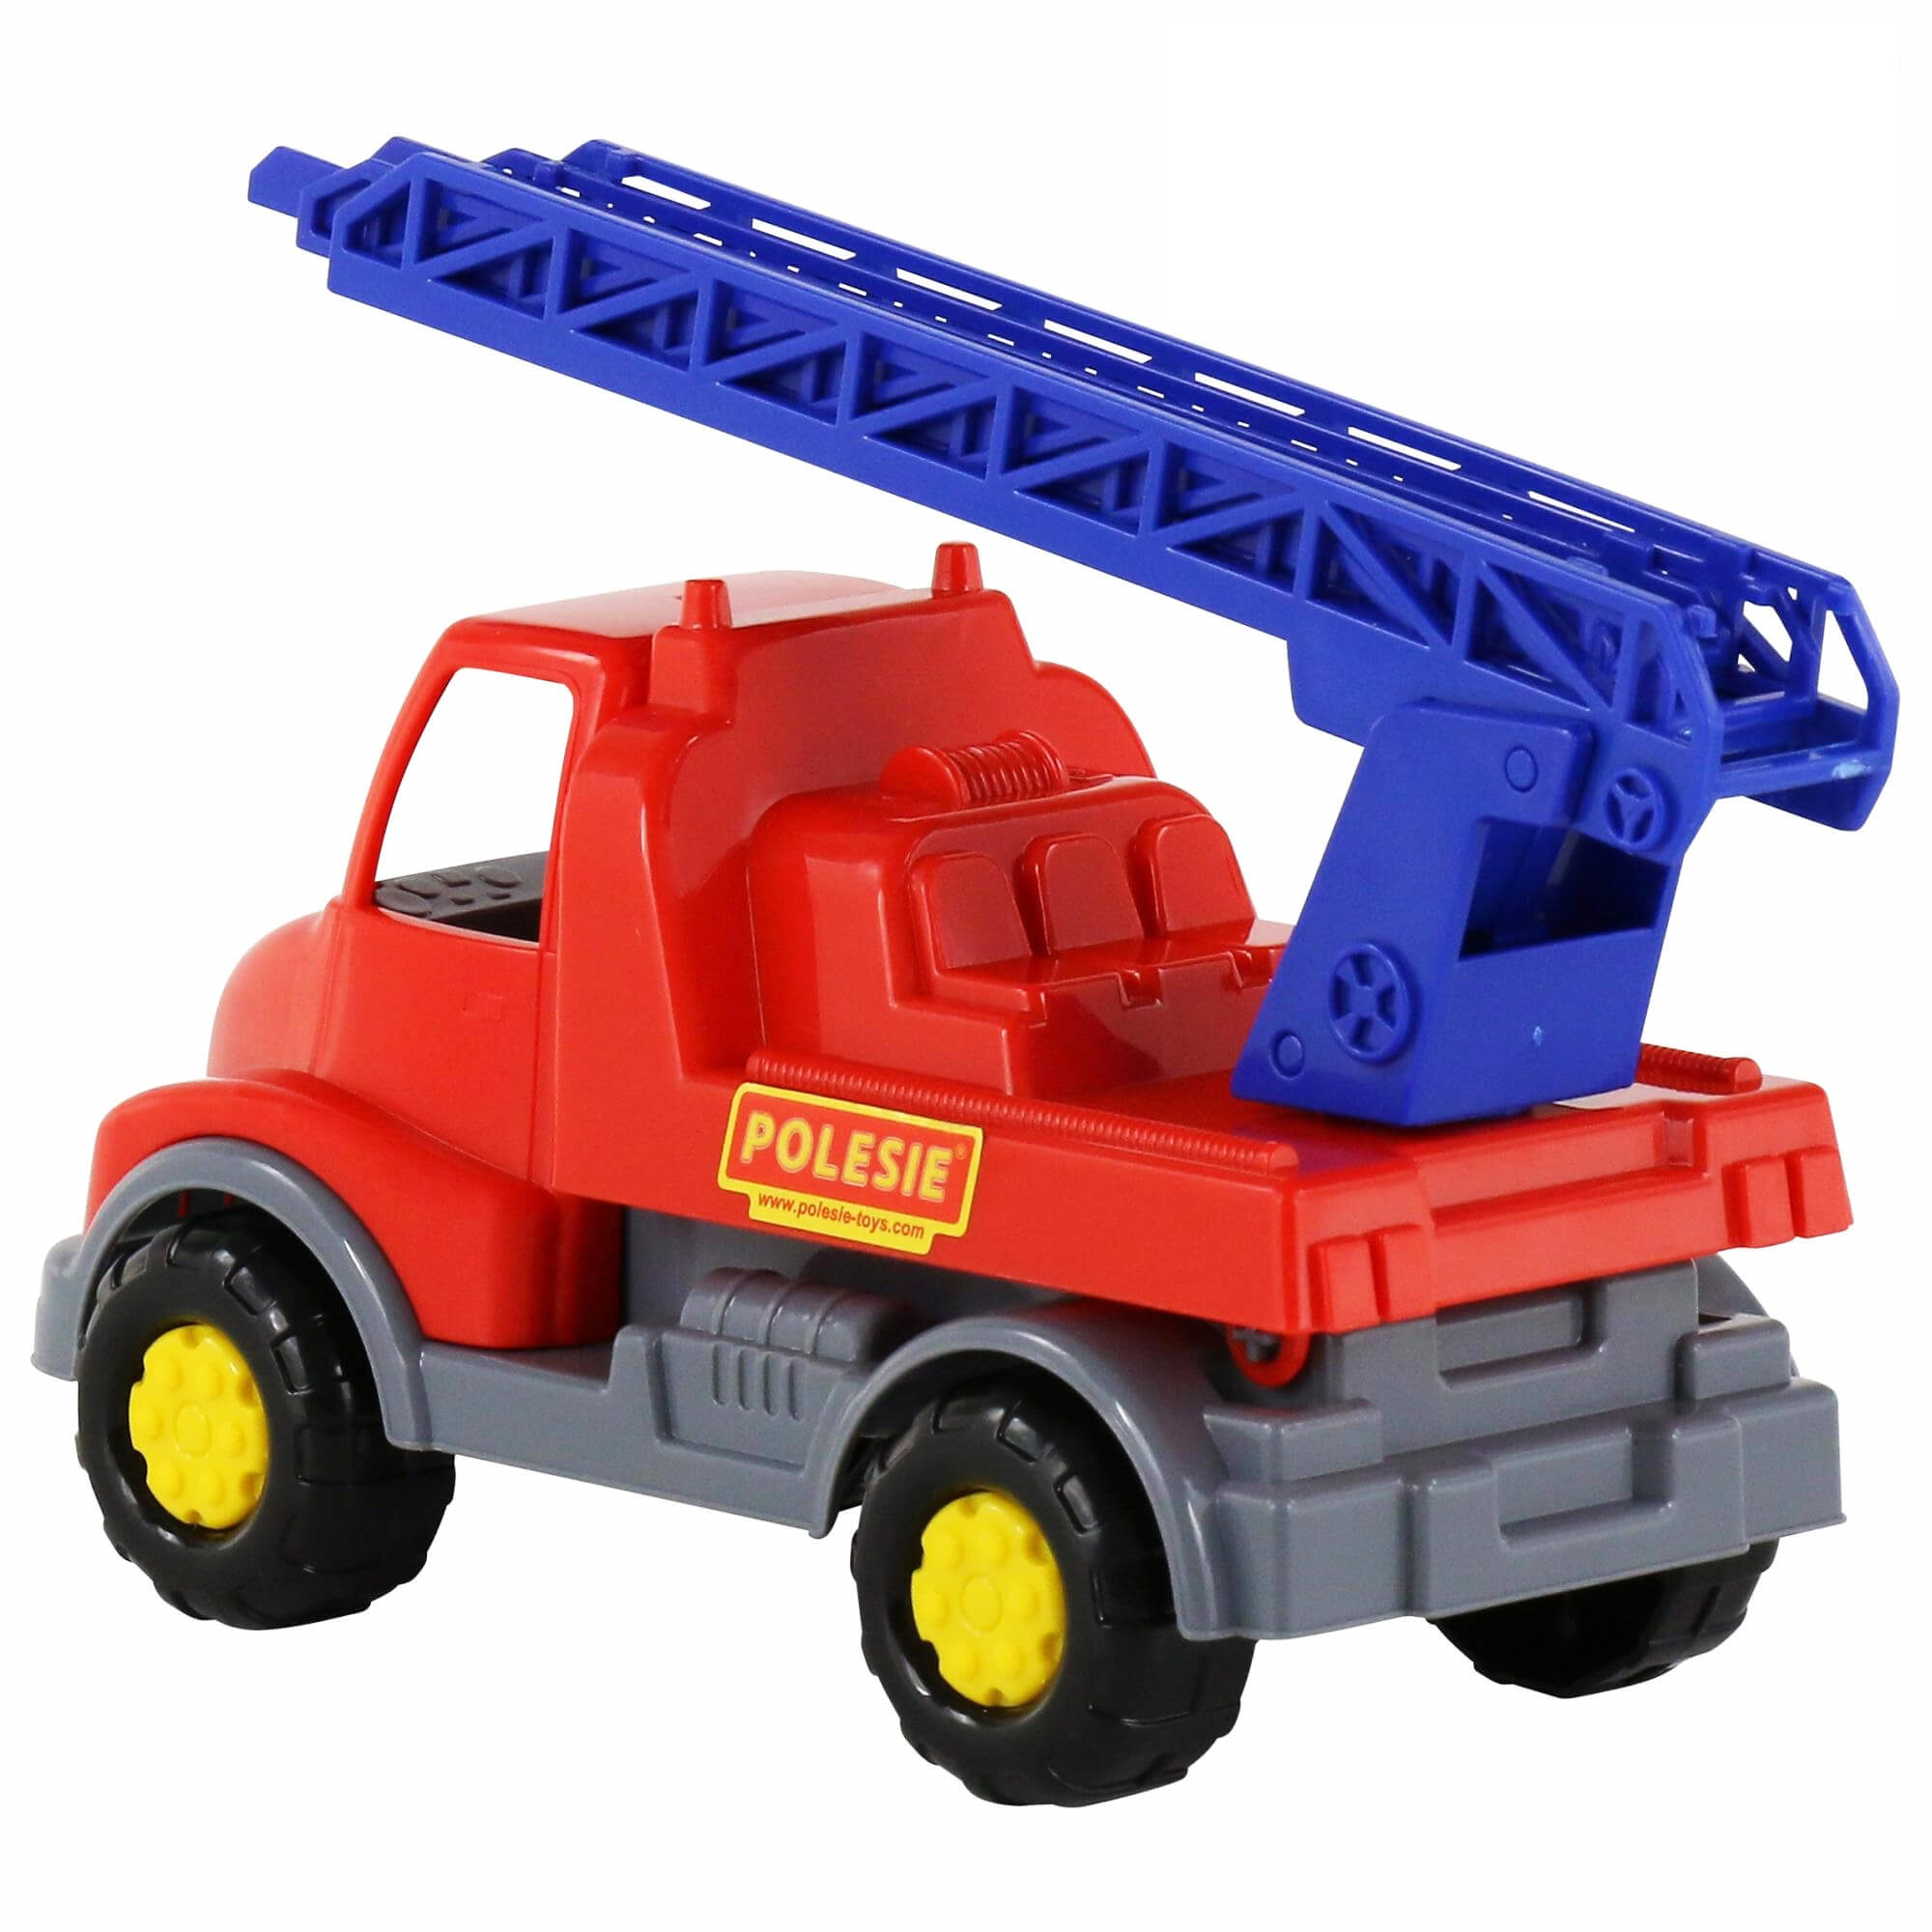 xe cứu hoả đồ chơi Leon Polesie Toys